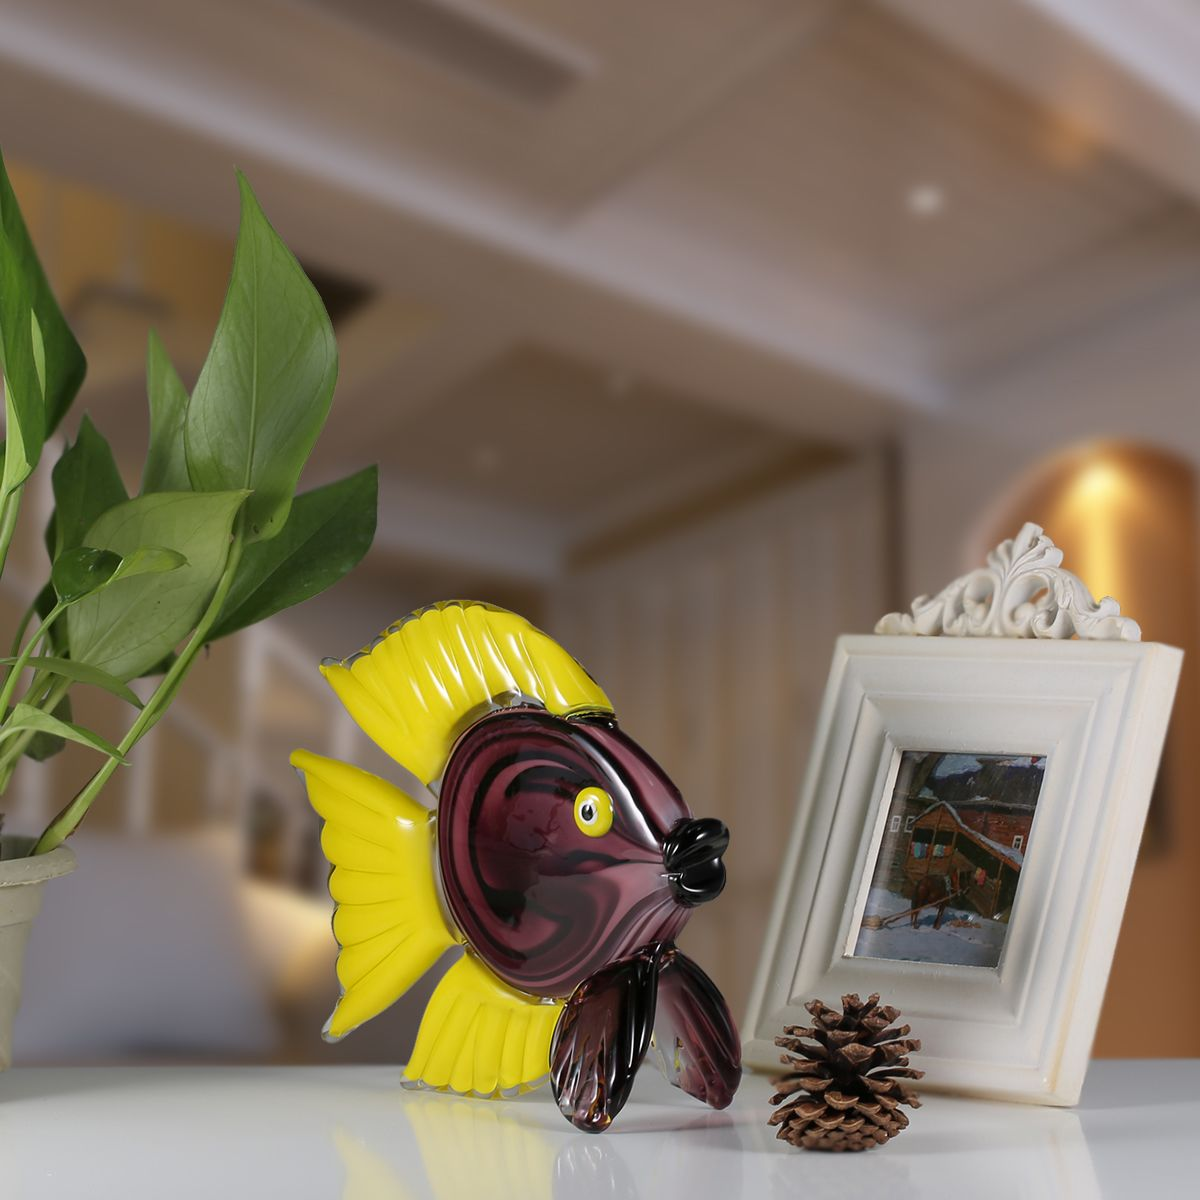 Tooarts Κίτρινο Τροπικό Υλικό ειδών - Διακόσμηση σπιτιού - Φωτογραφία 6